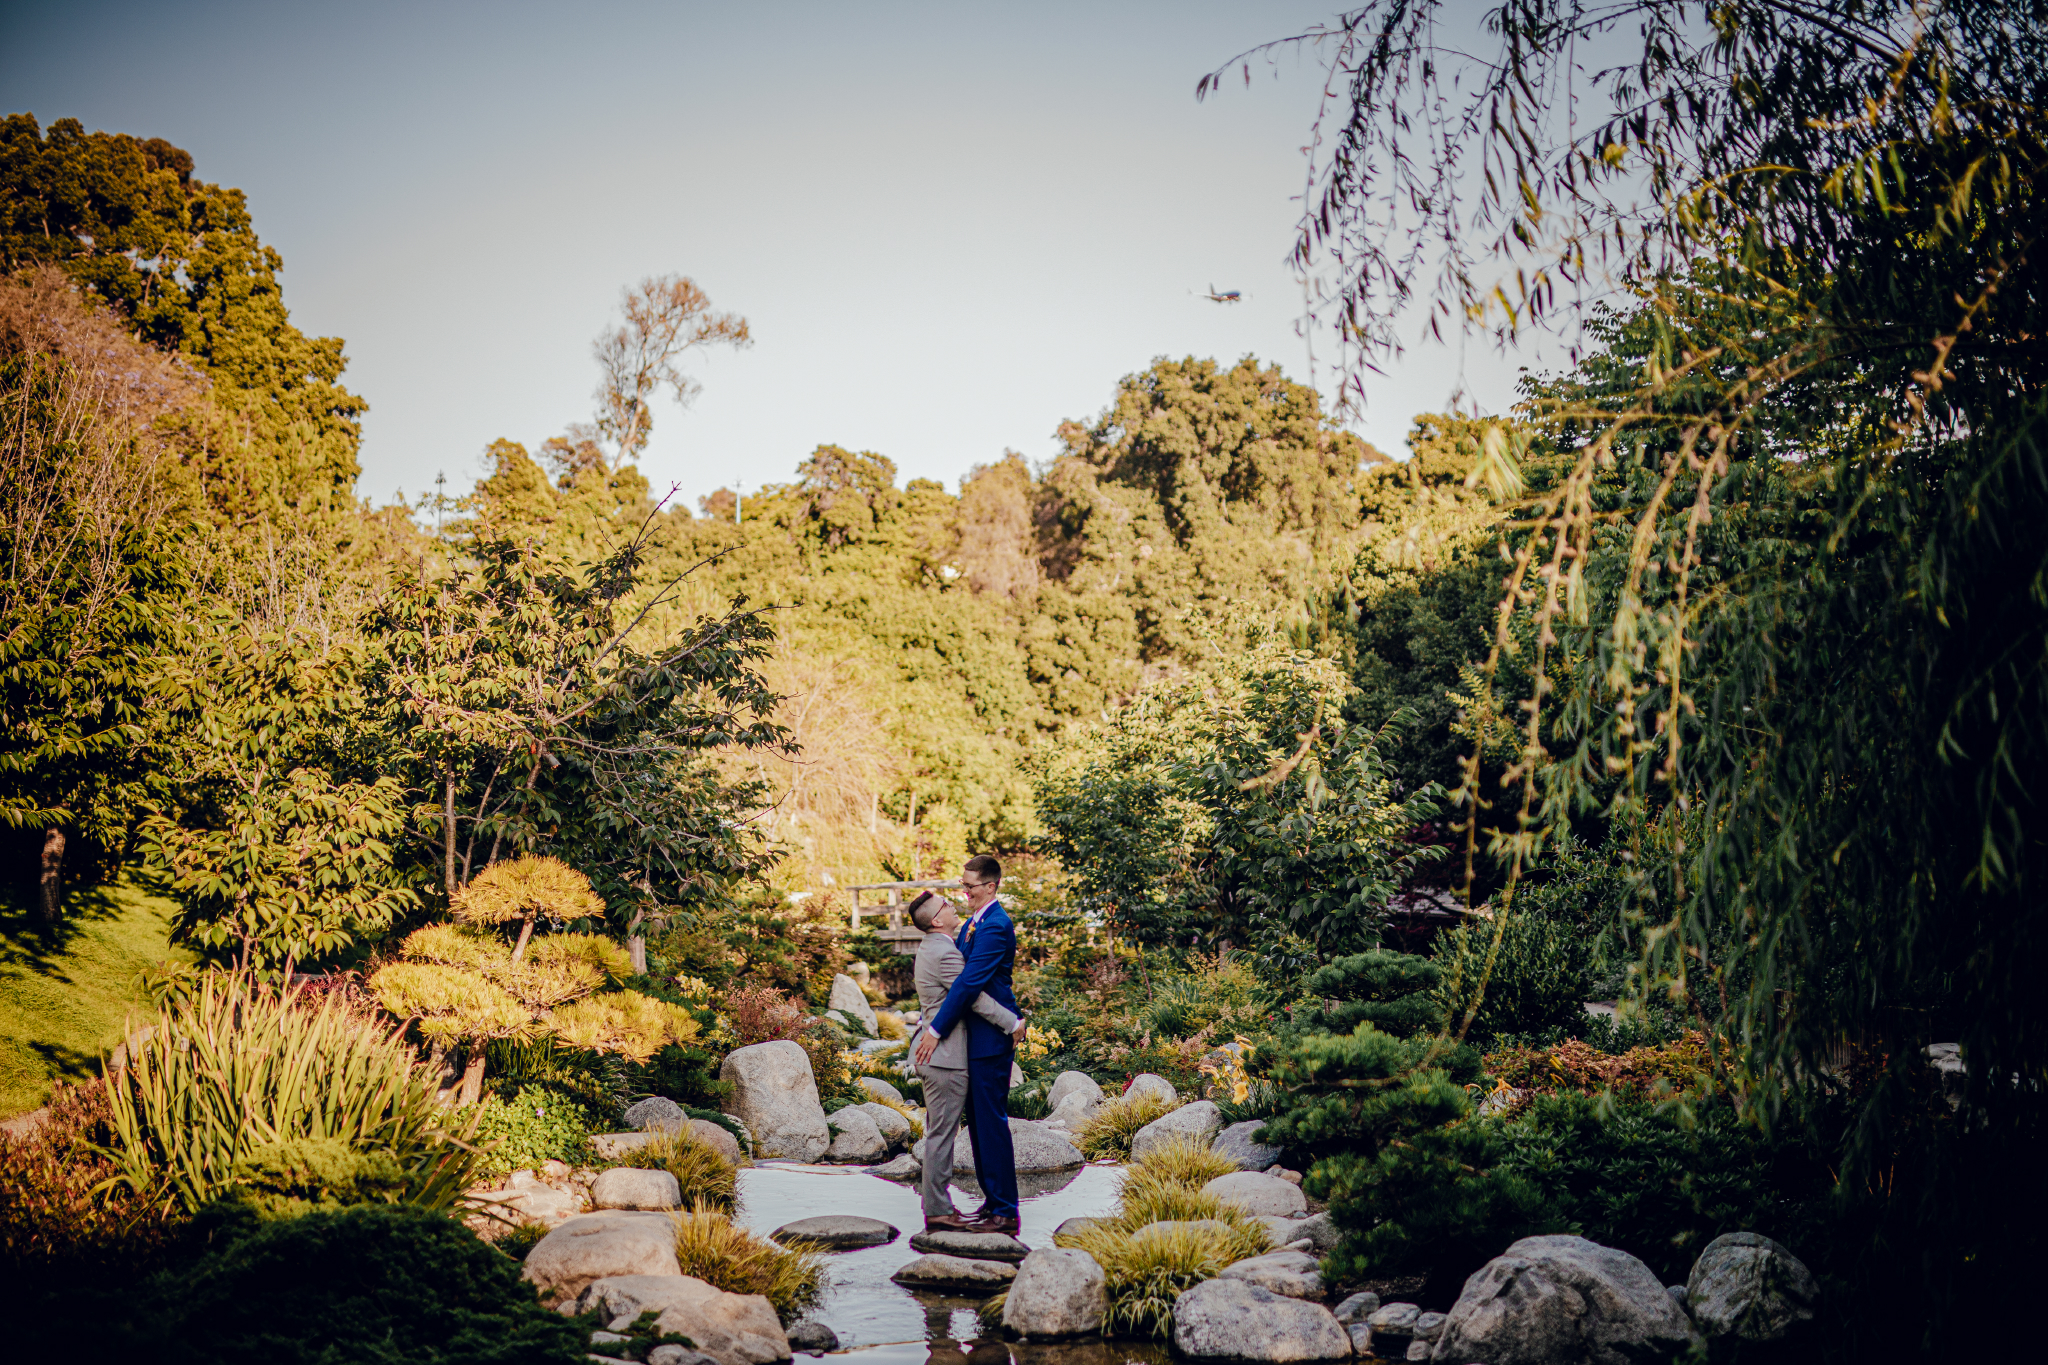 Japanese friendship garden, Balboa park wedding053.JPG